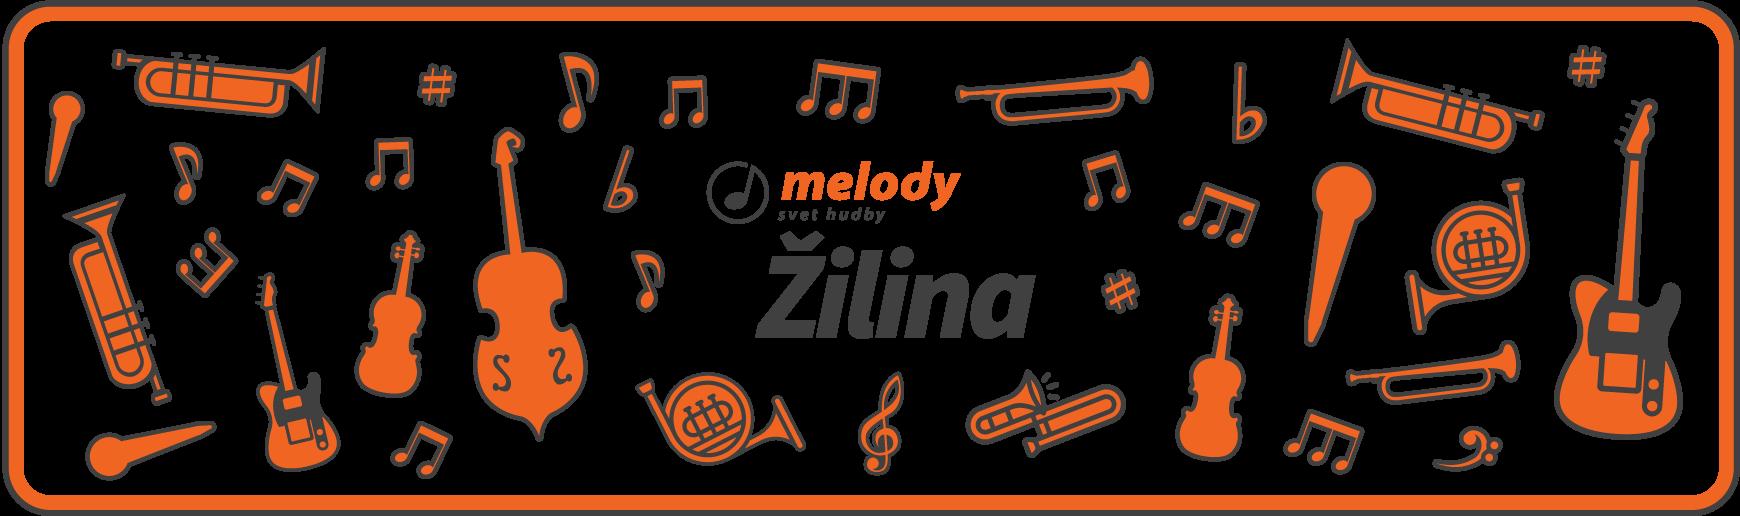 melody_zilina